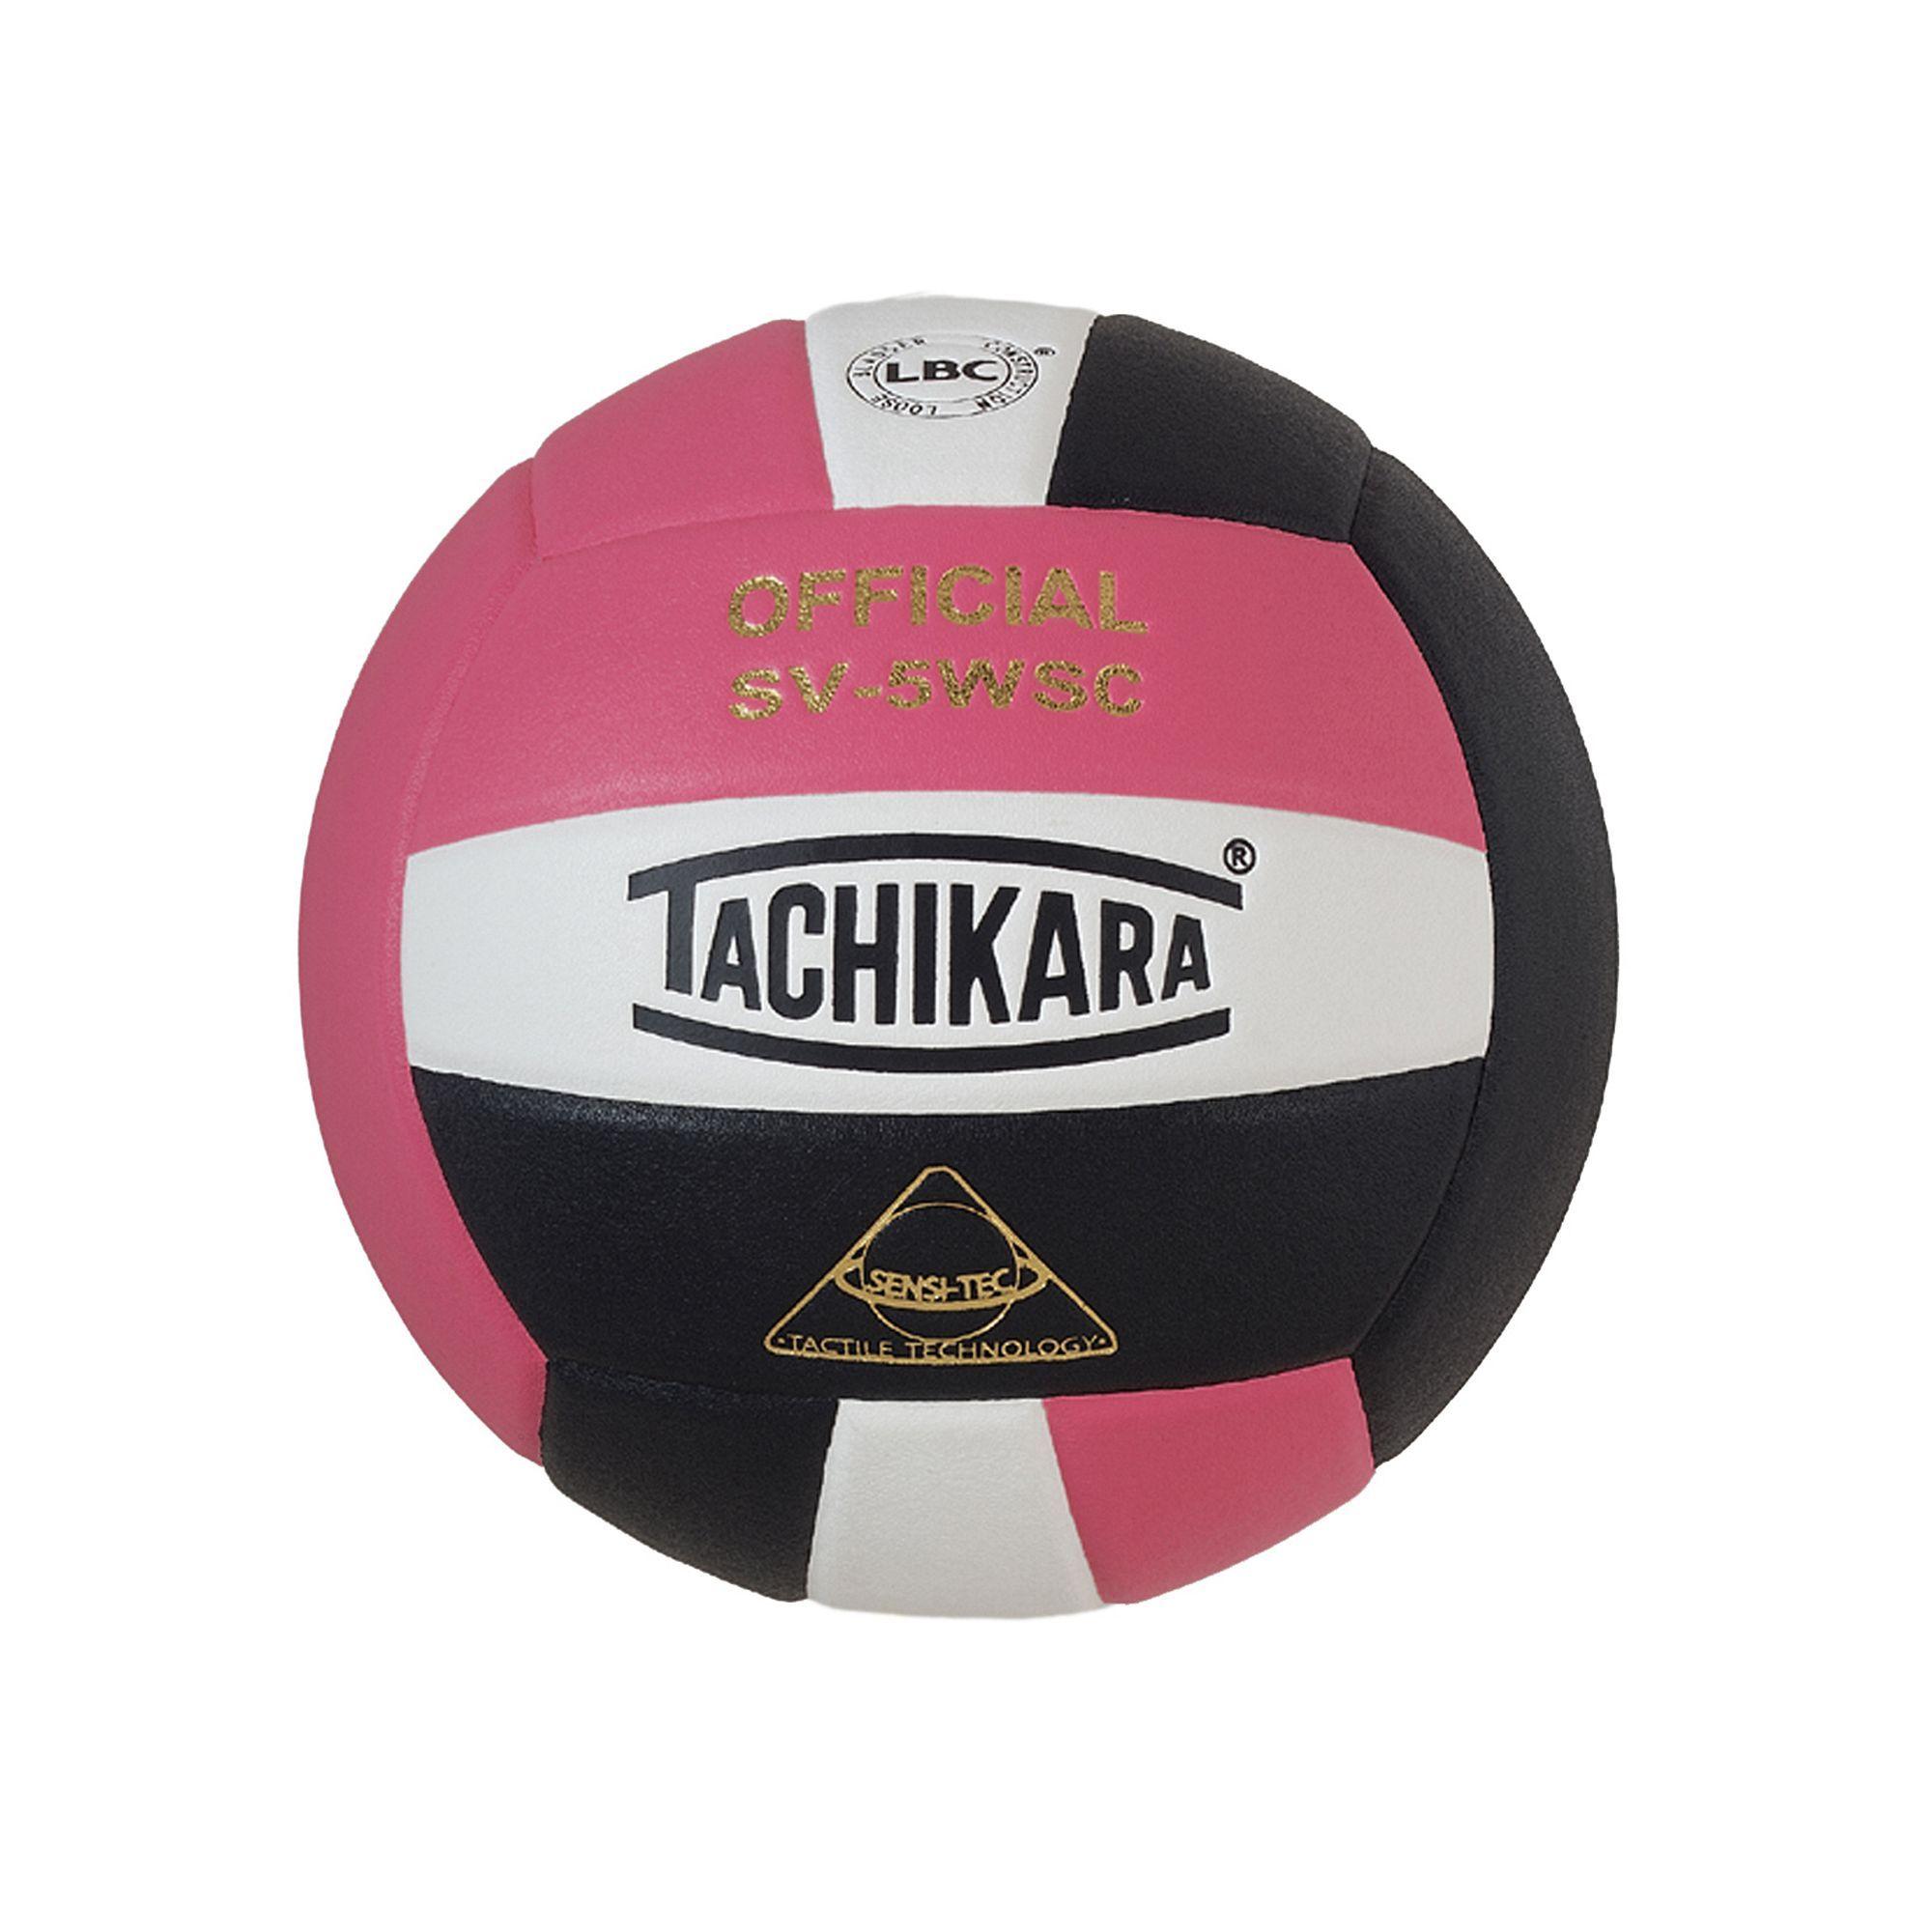 Tachikara Official Sv5wsc Microfiber Composite Leather Volleyball Indoor Volleyball Volleyball Volleyballs